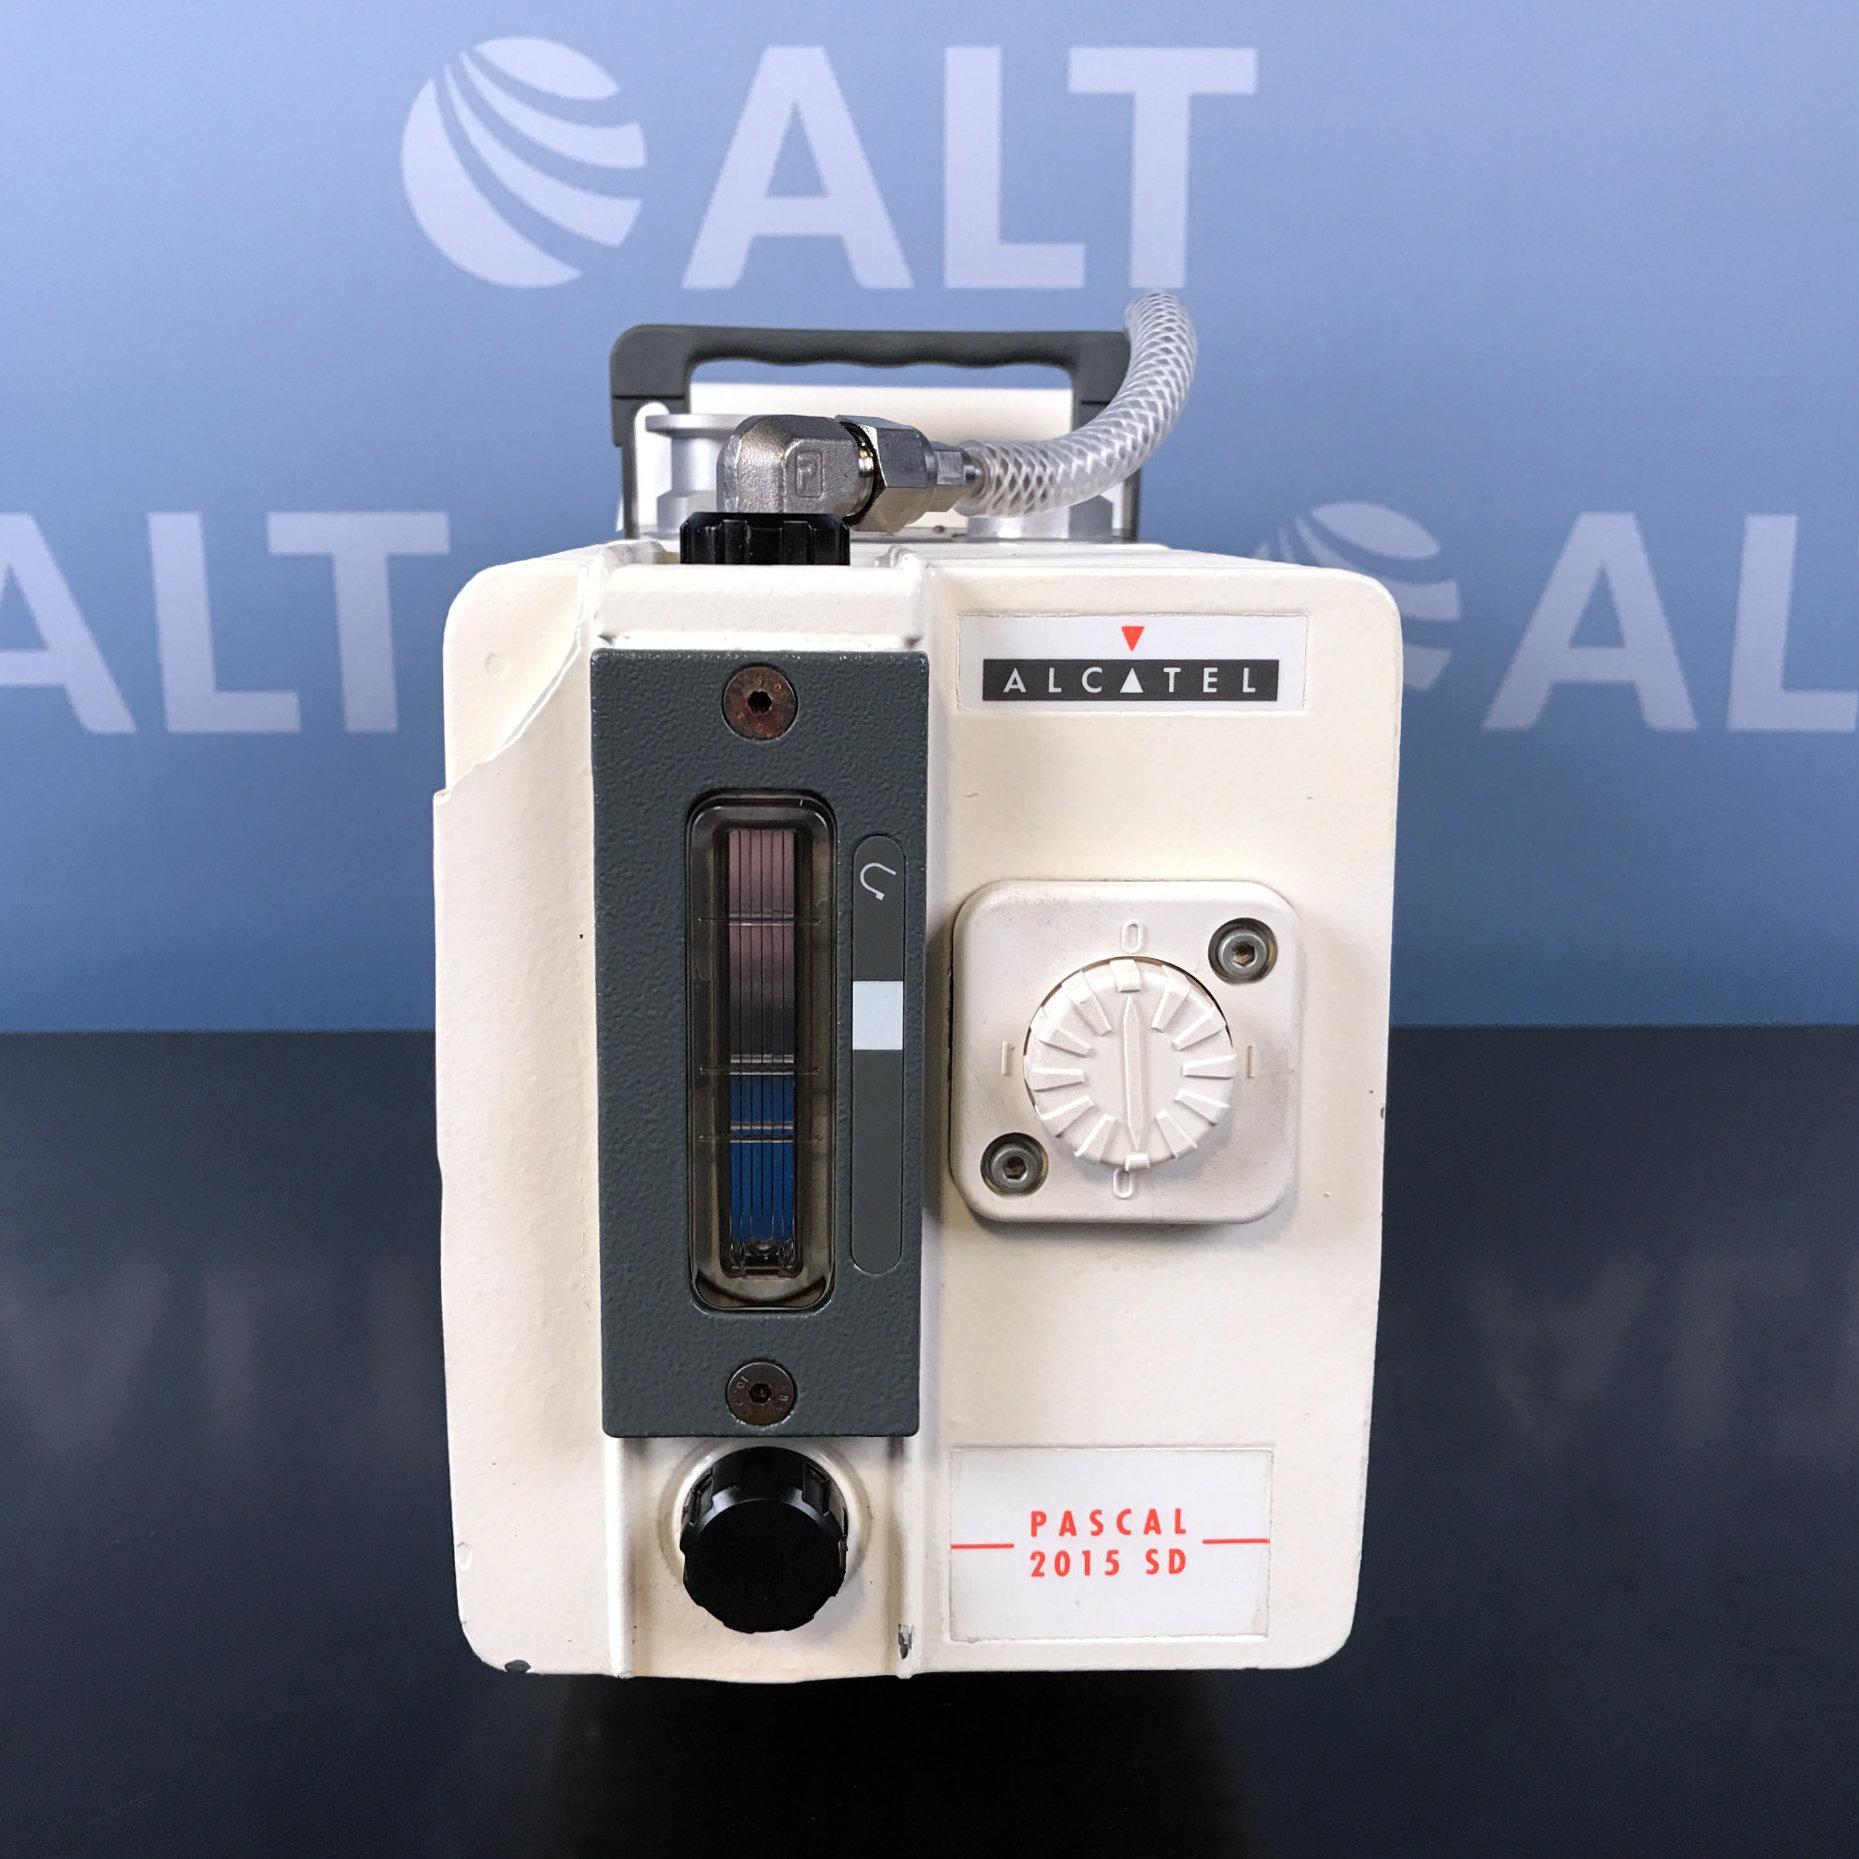 Alcatel Pascal 2015 SD Dual Stage Rotary Vane Vacuum Pump Image